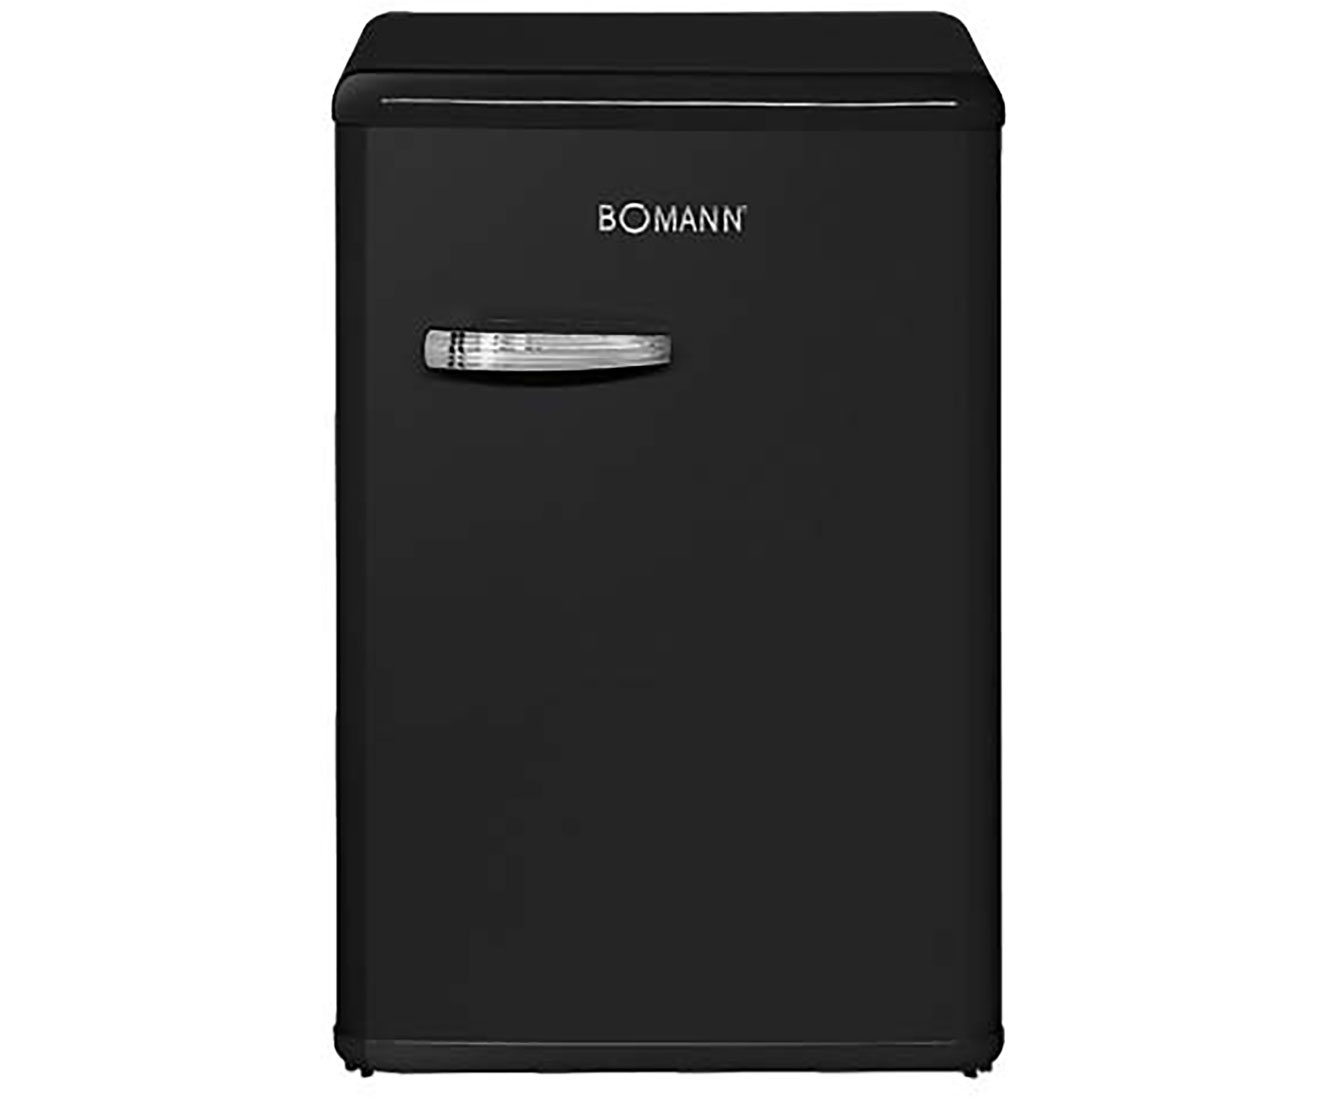 Bomann VSR 352 Kühlschränke - Schwarz